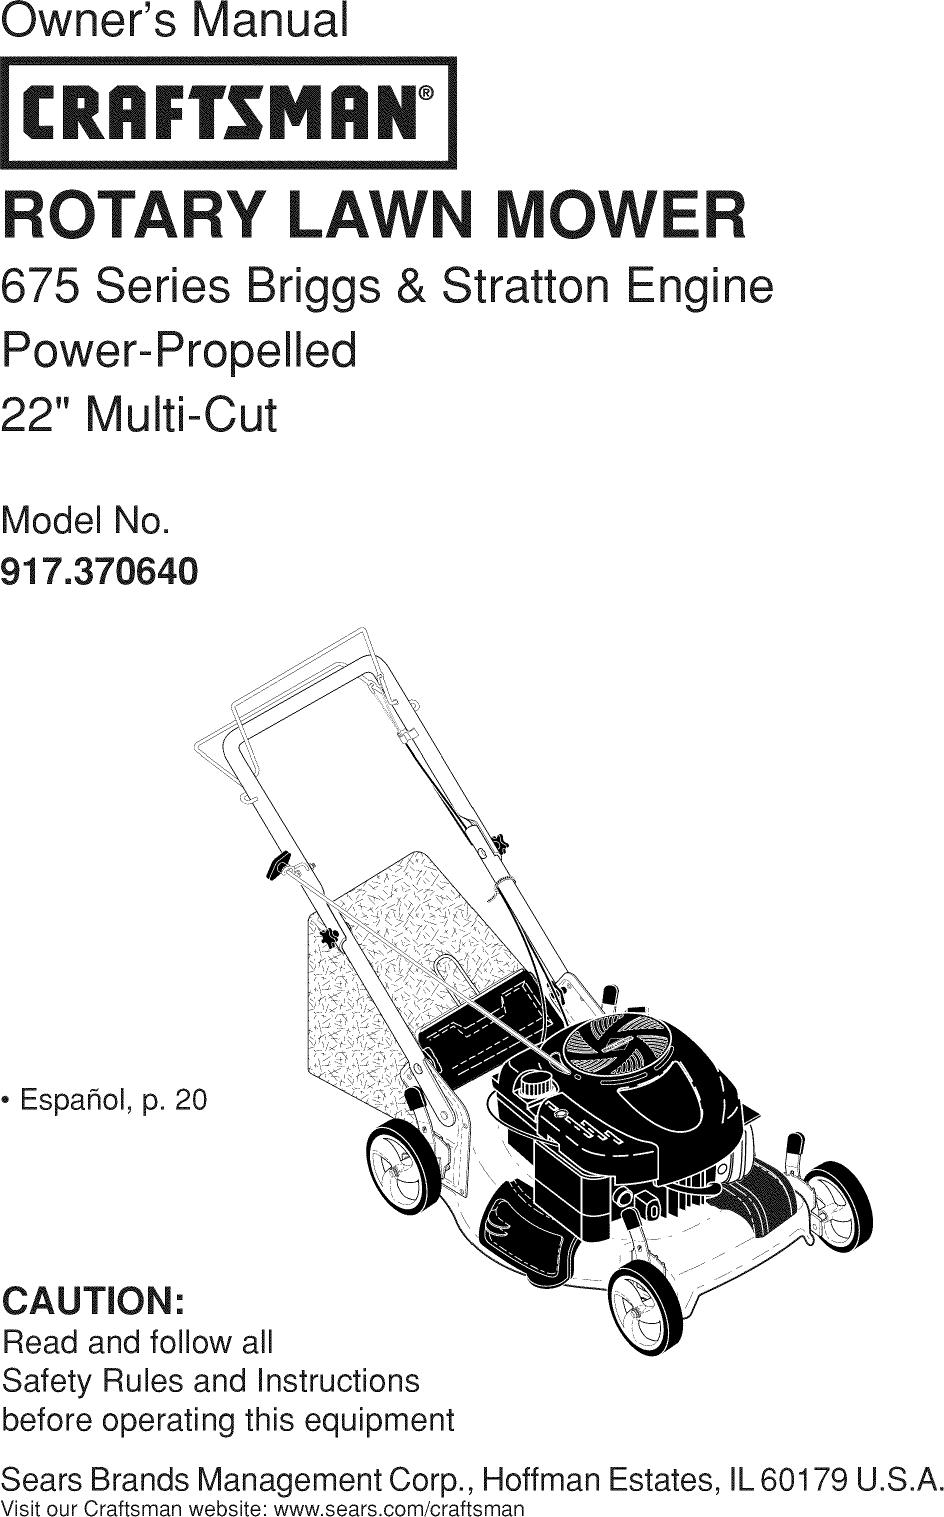 Craftsman 917370640 User Manual MOWER Manuals And Guides